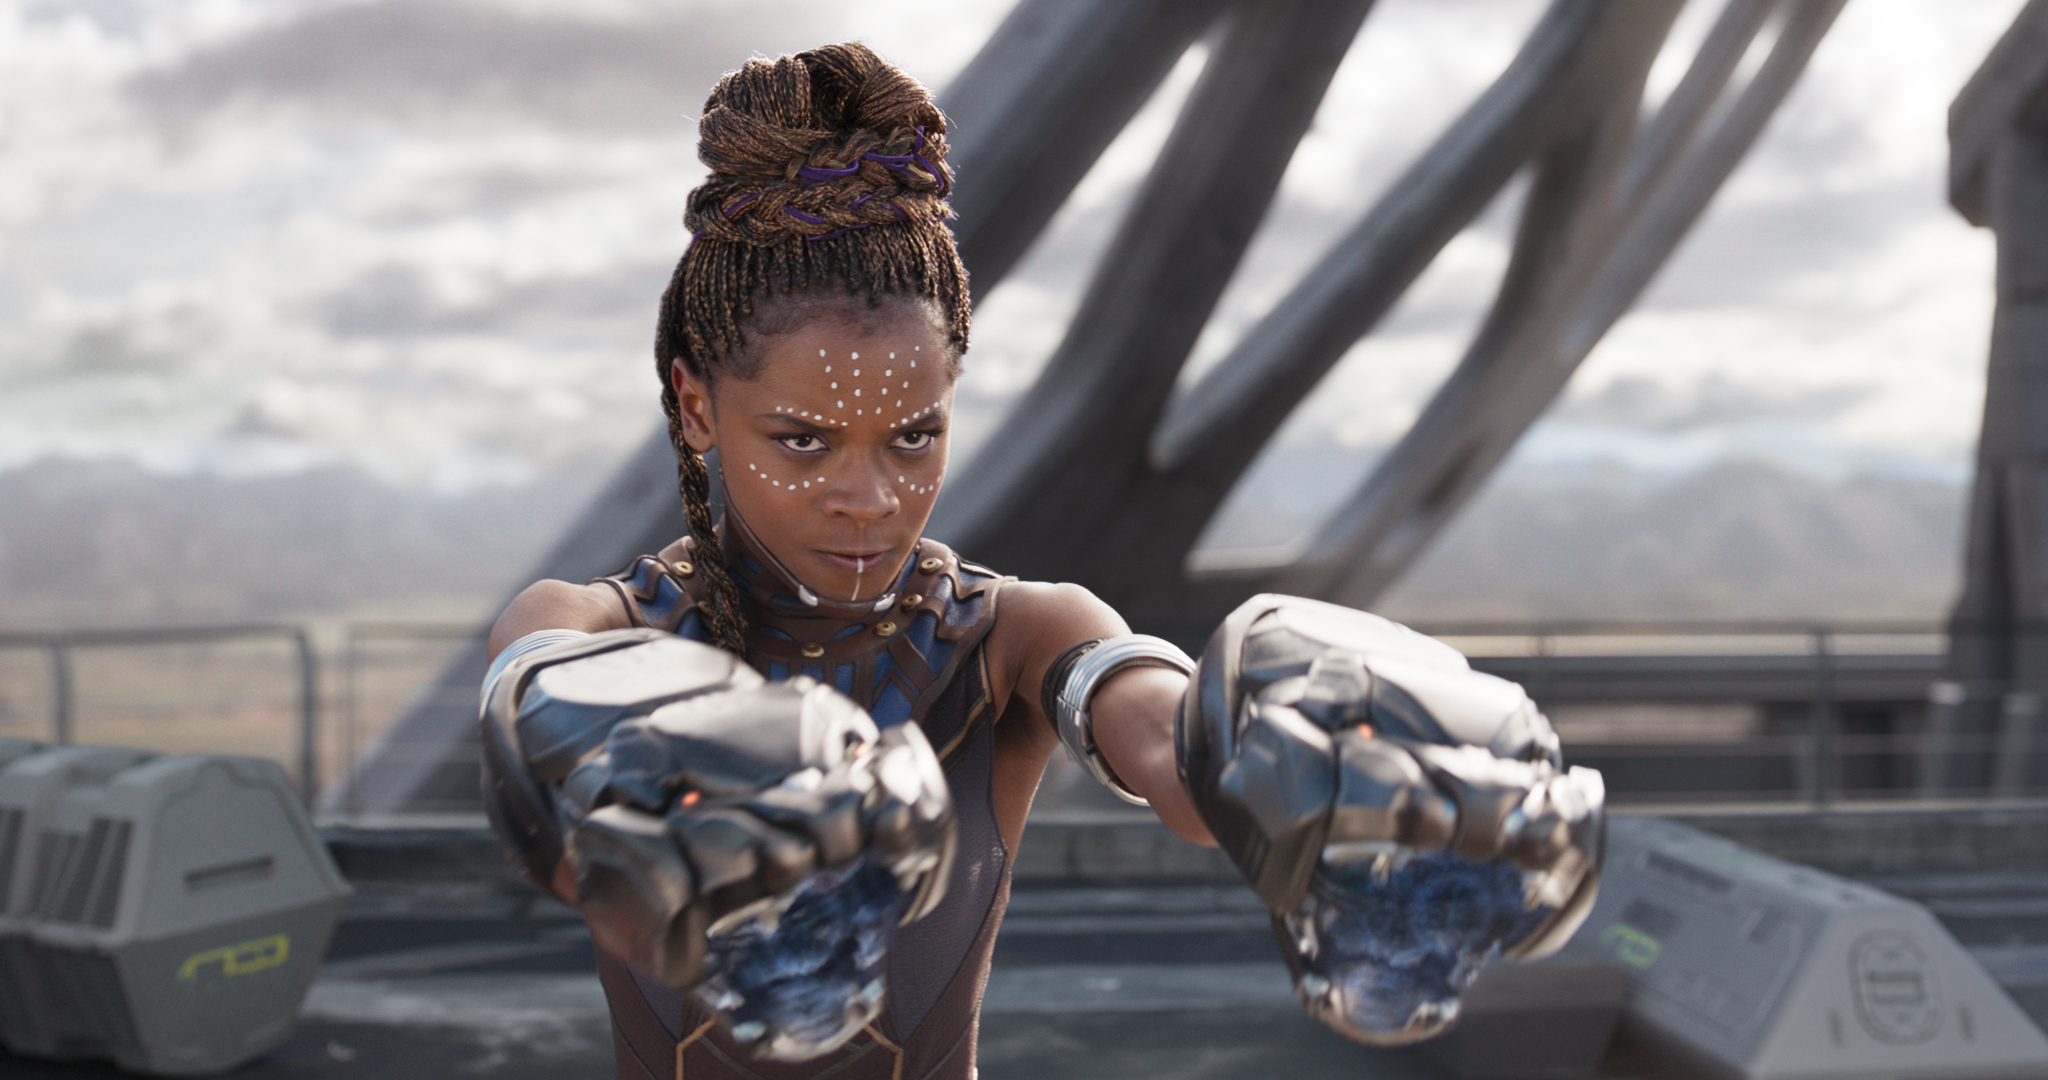 Avengers: Endgame trailer reveals the fate of Shuri